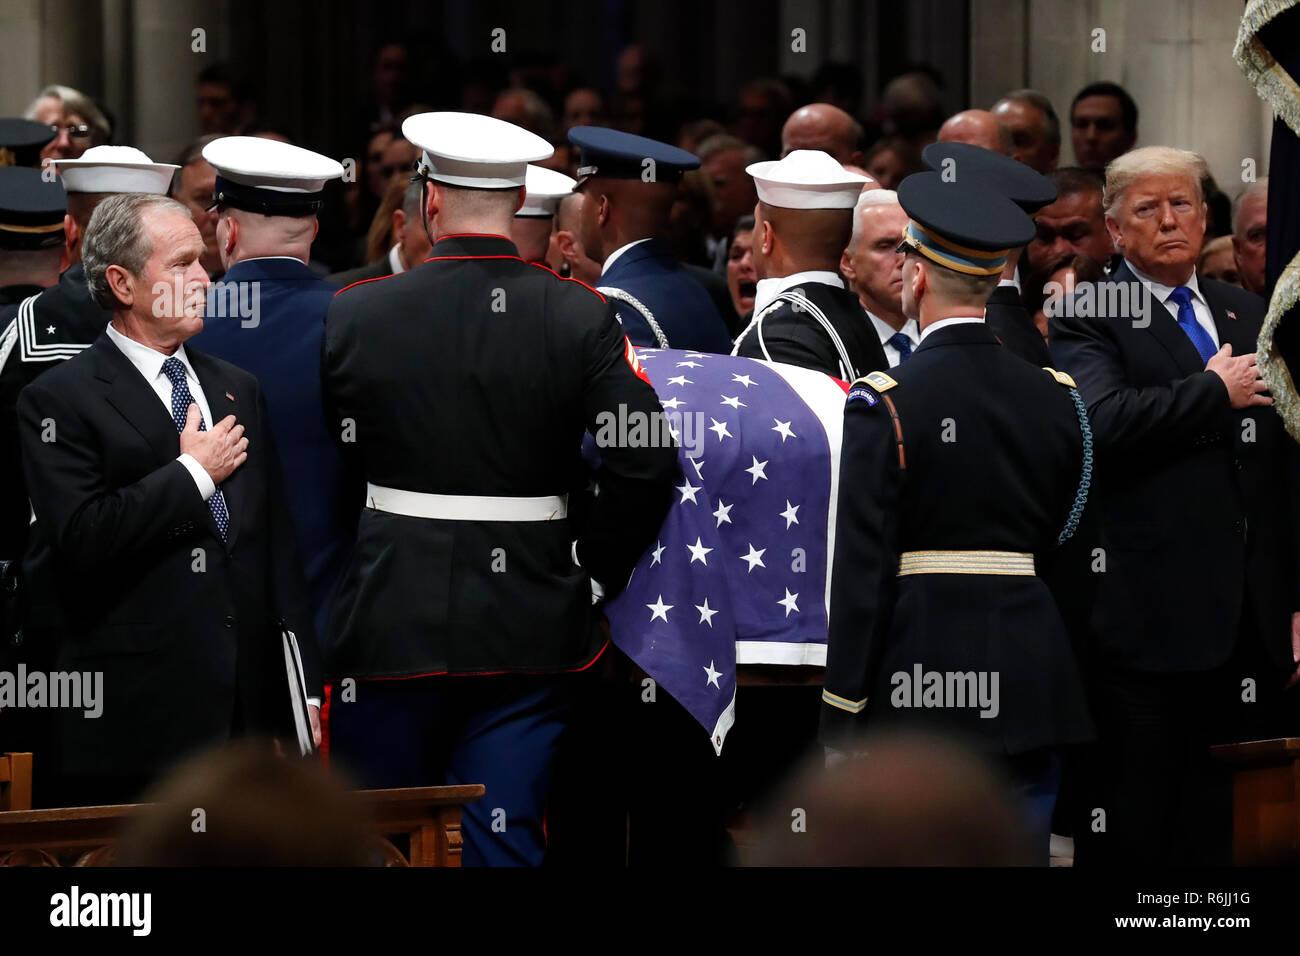 former president george w bush left and president donald trump